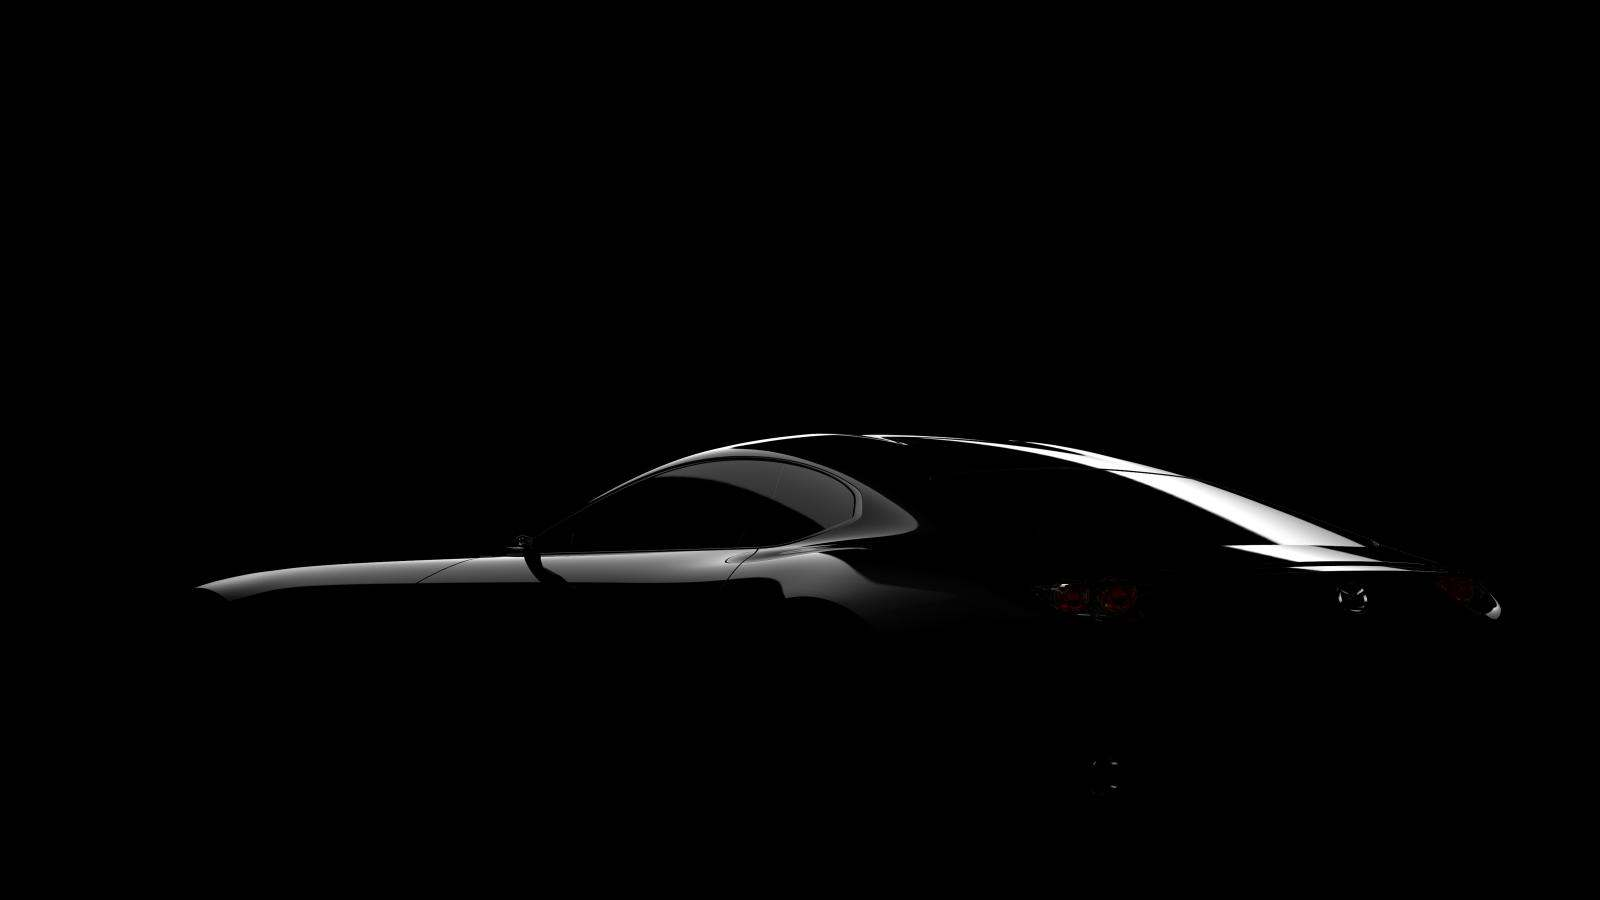 [Image: S0-Mazda-devoilera-une-RX-9-Concept-lors...364584.jpg]